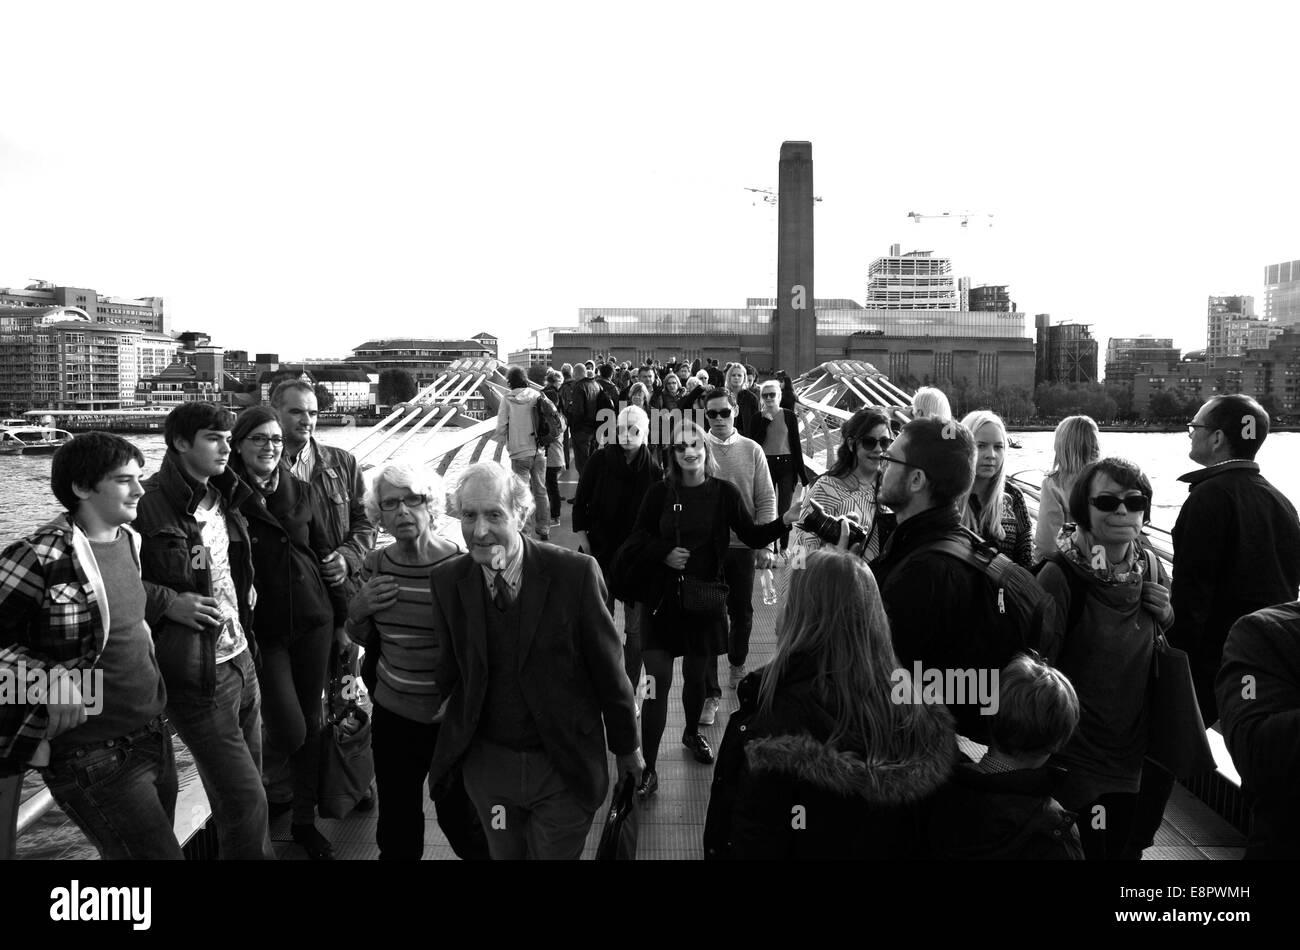 London UK October 2014 - Visitors crowd across the Millennium footbridge across the River Thames - Stock Image